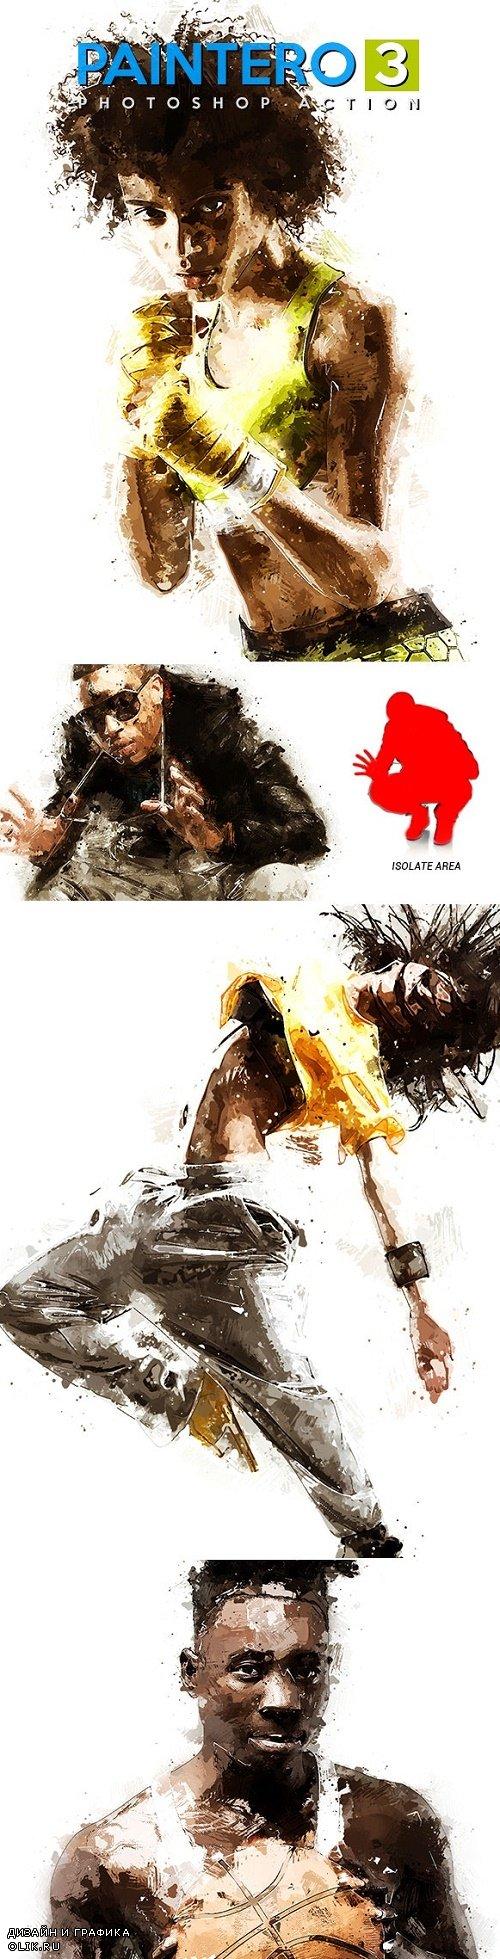 Paintero 3 - Photoshop Action 24042087